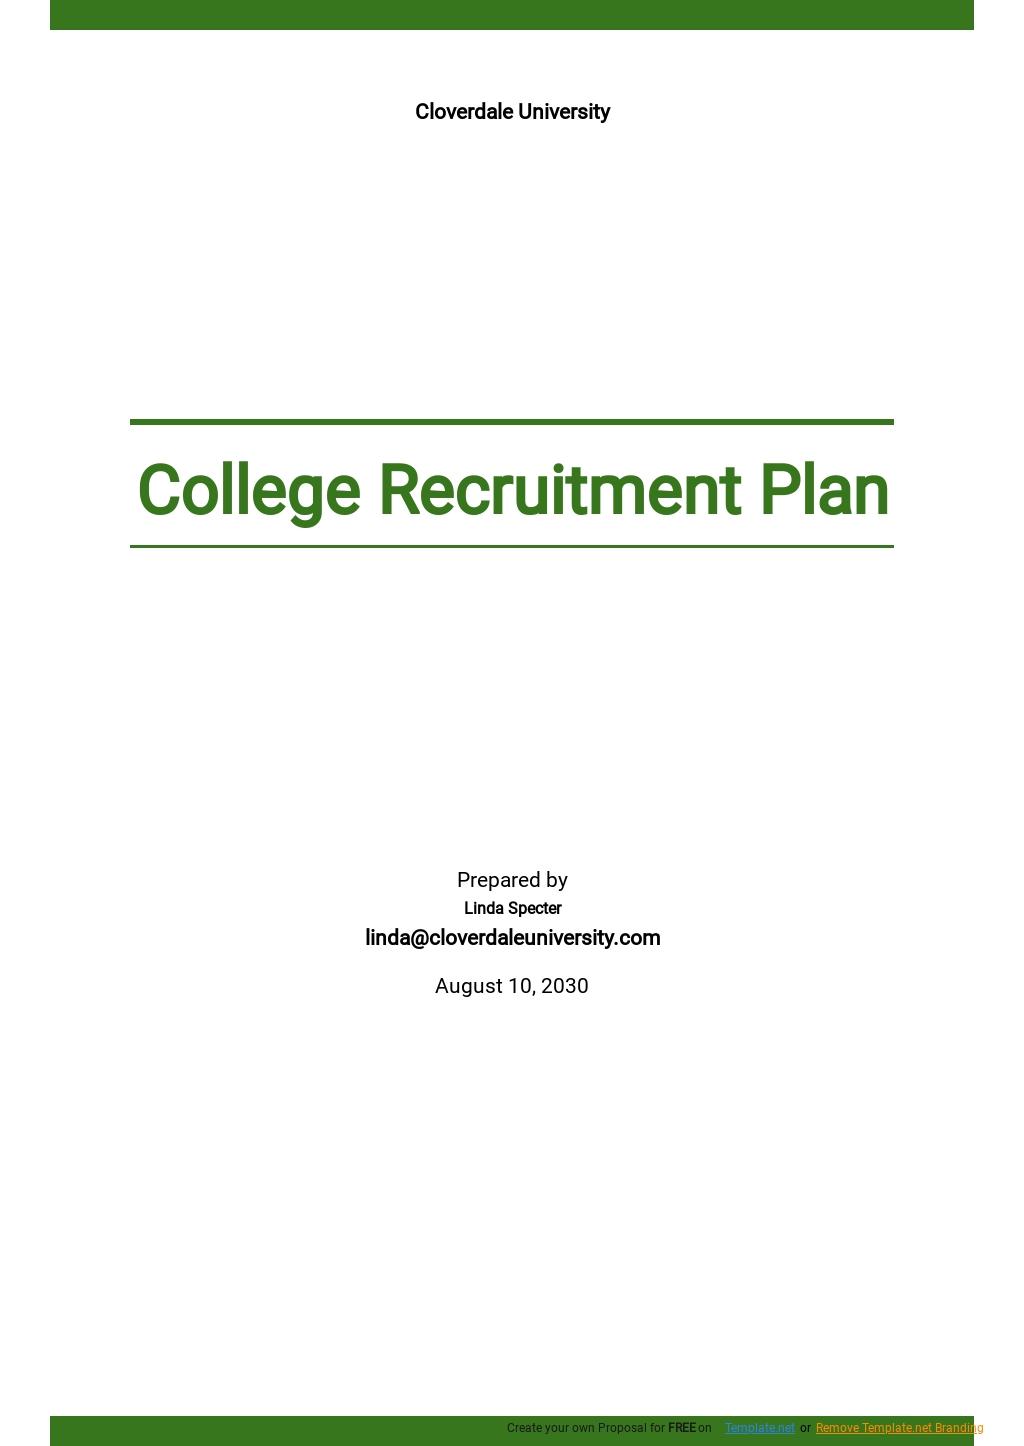 College Recruitment Plan Template.jpe